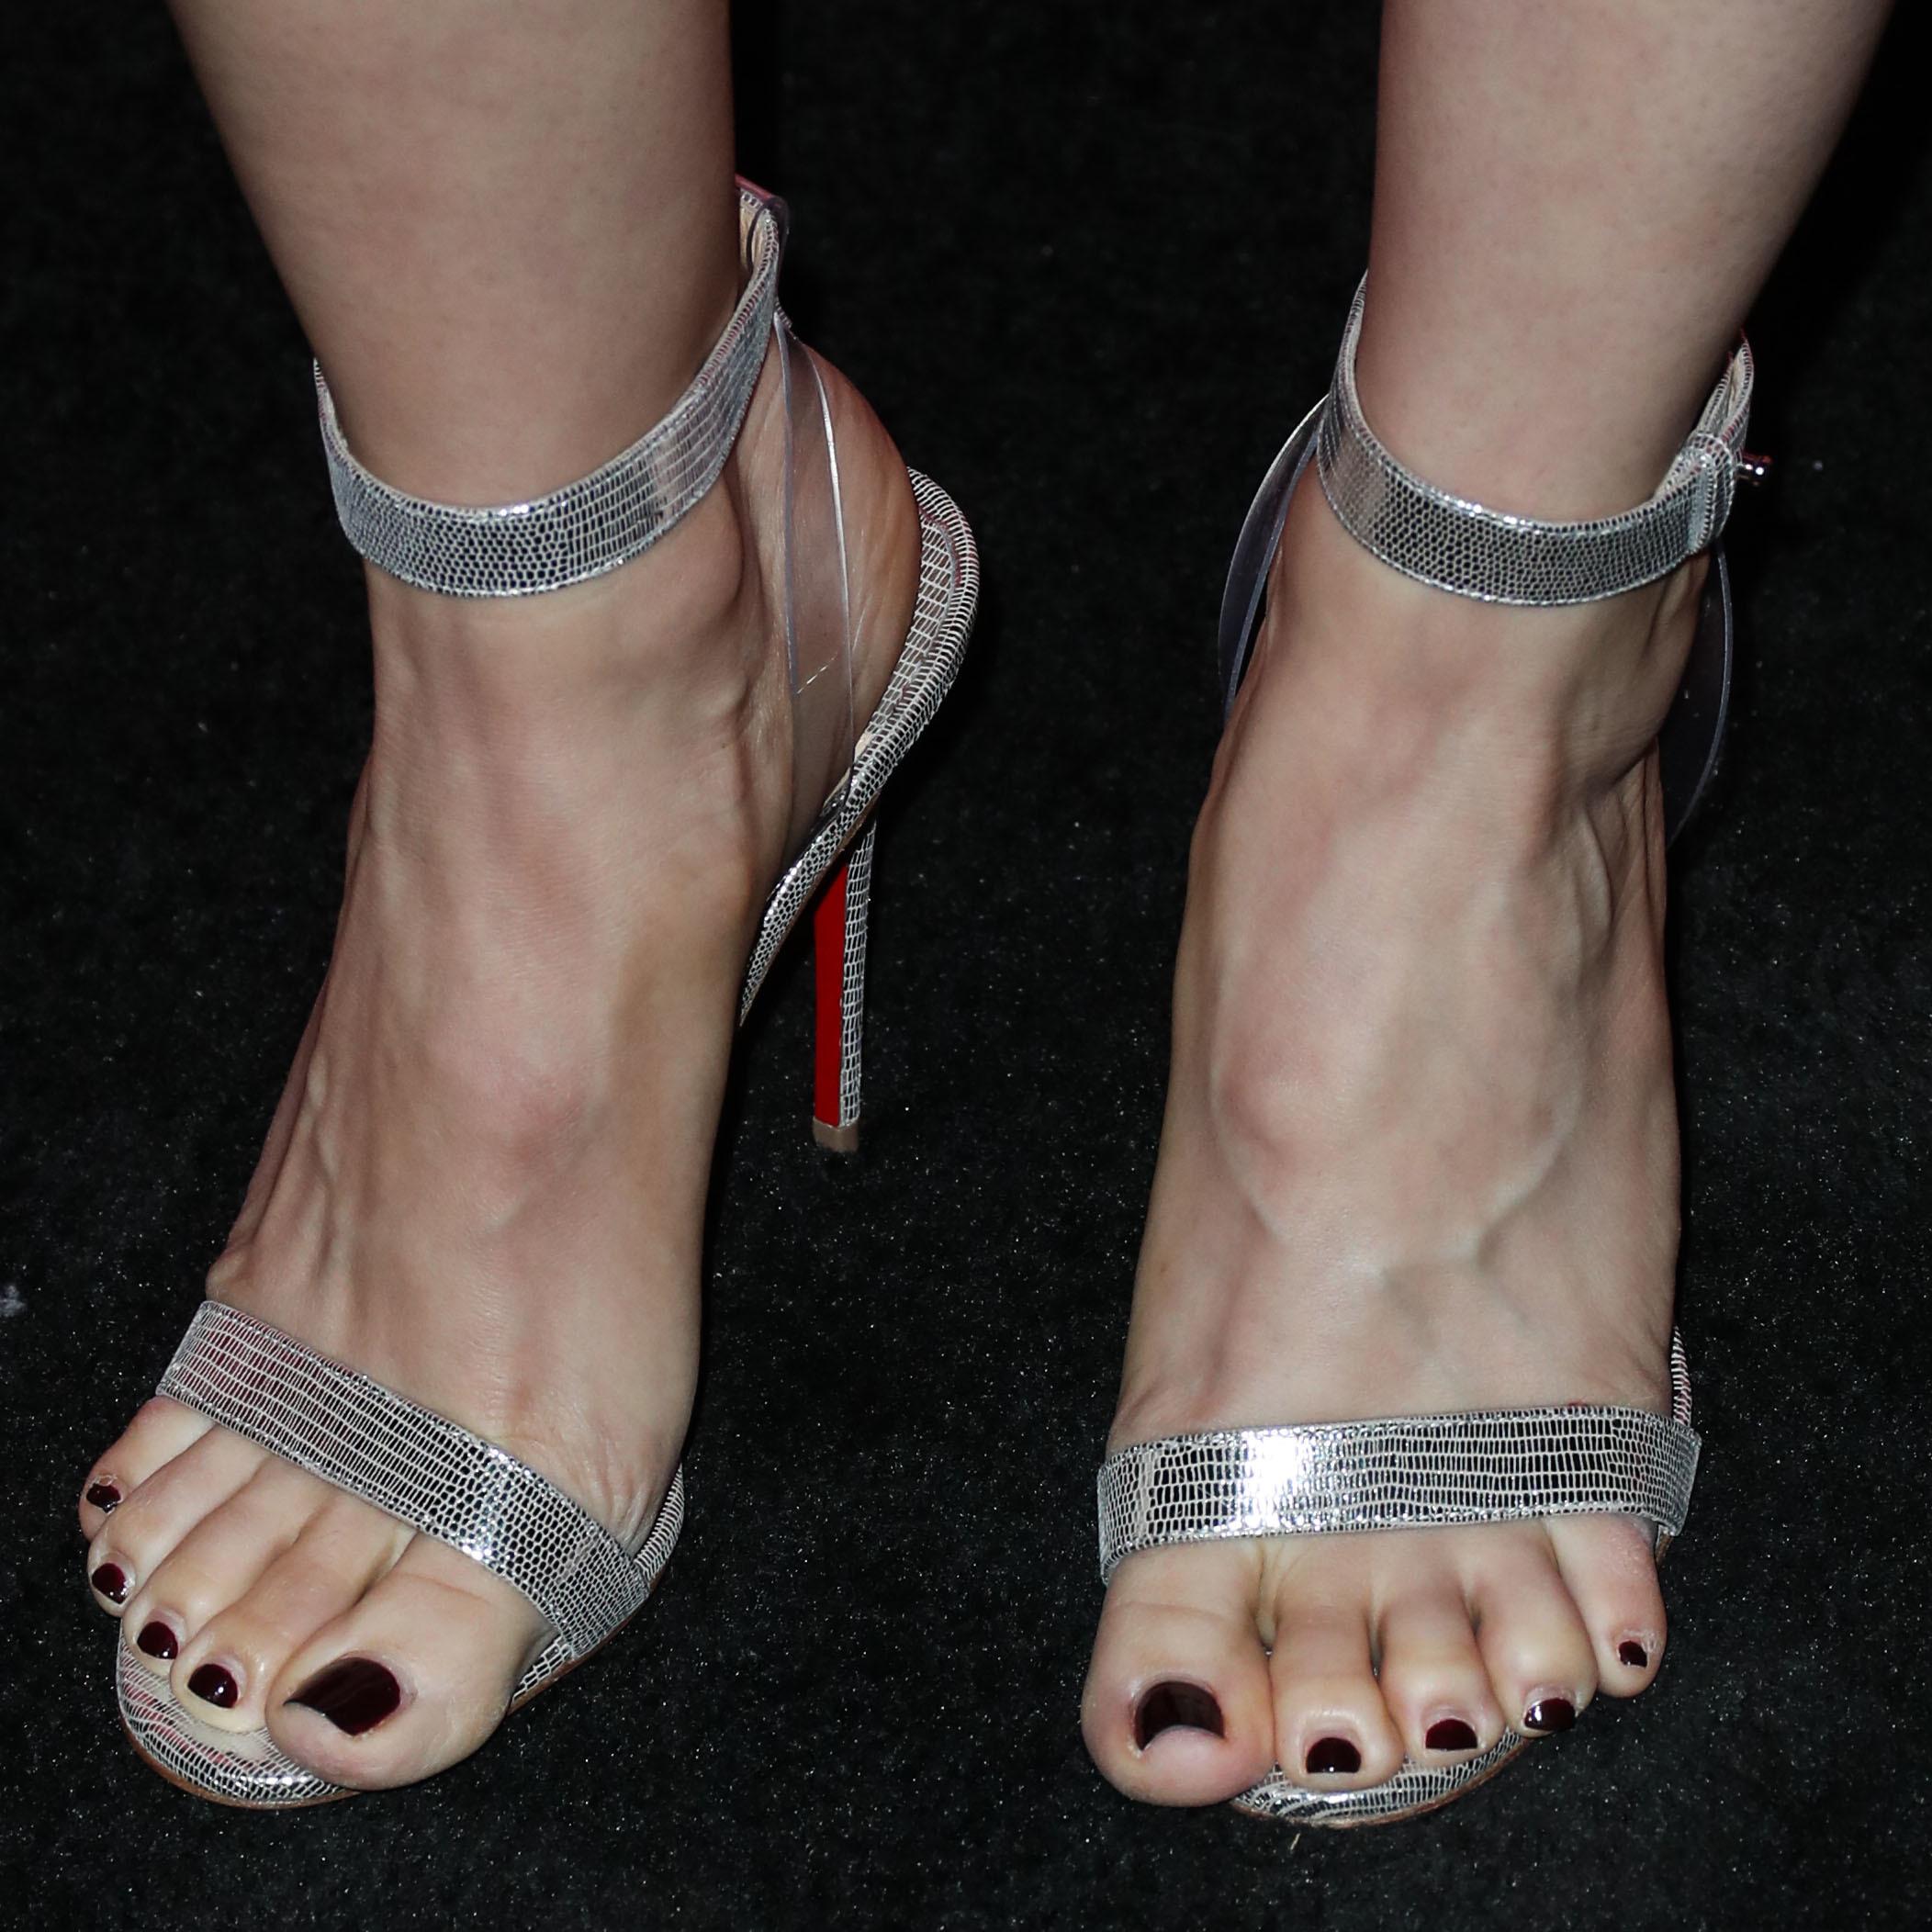 Feet Alison Brie nudes (69 foto and video), Topless, Leaked, Instagram, bra 2020